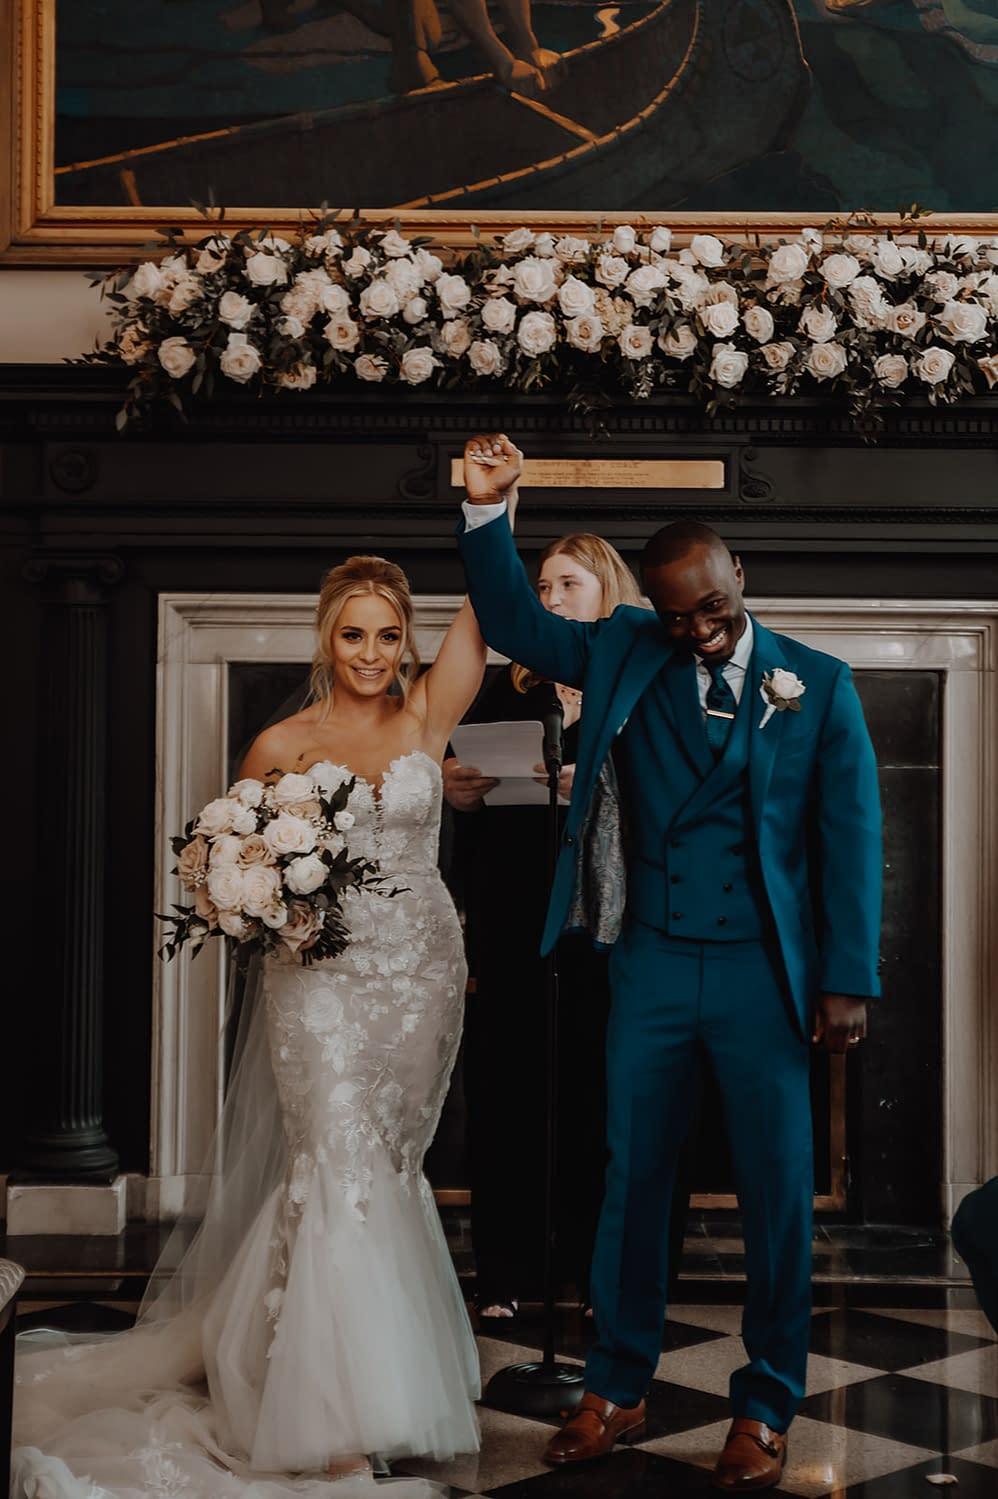 Wedding ceremony exit, captured by Adirondack photographers The Pinckards